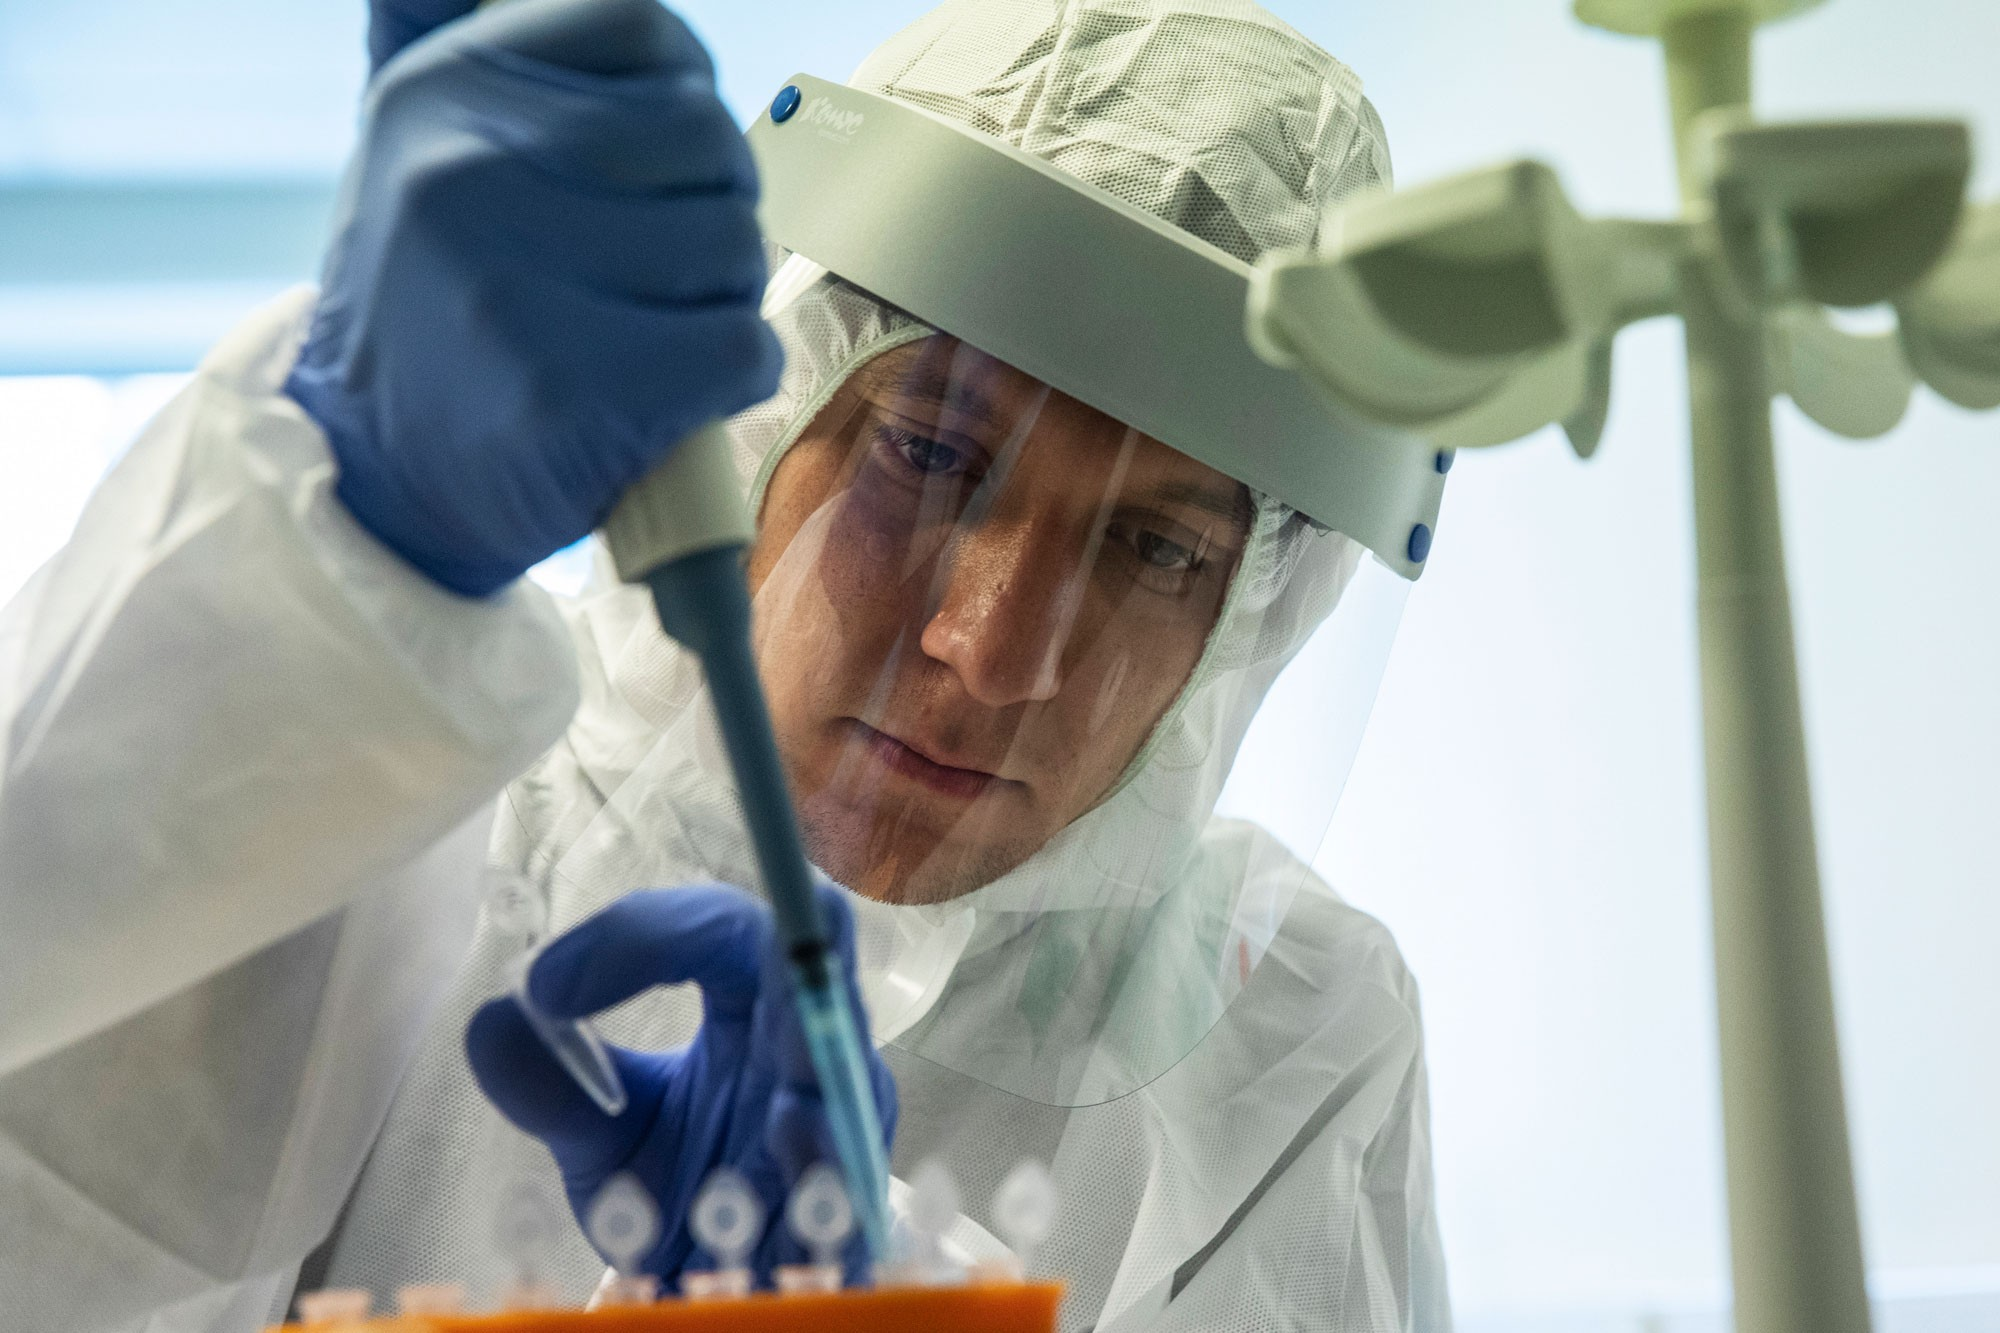 Piauí ultrapassa 65 mil casos e chega a 1.594 mortes causadas pelo novo coronavírus